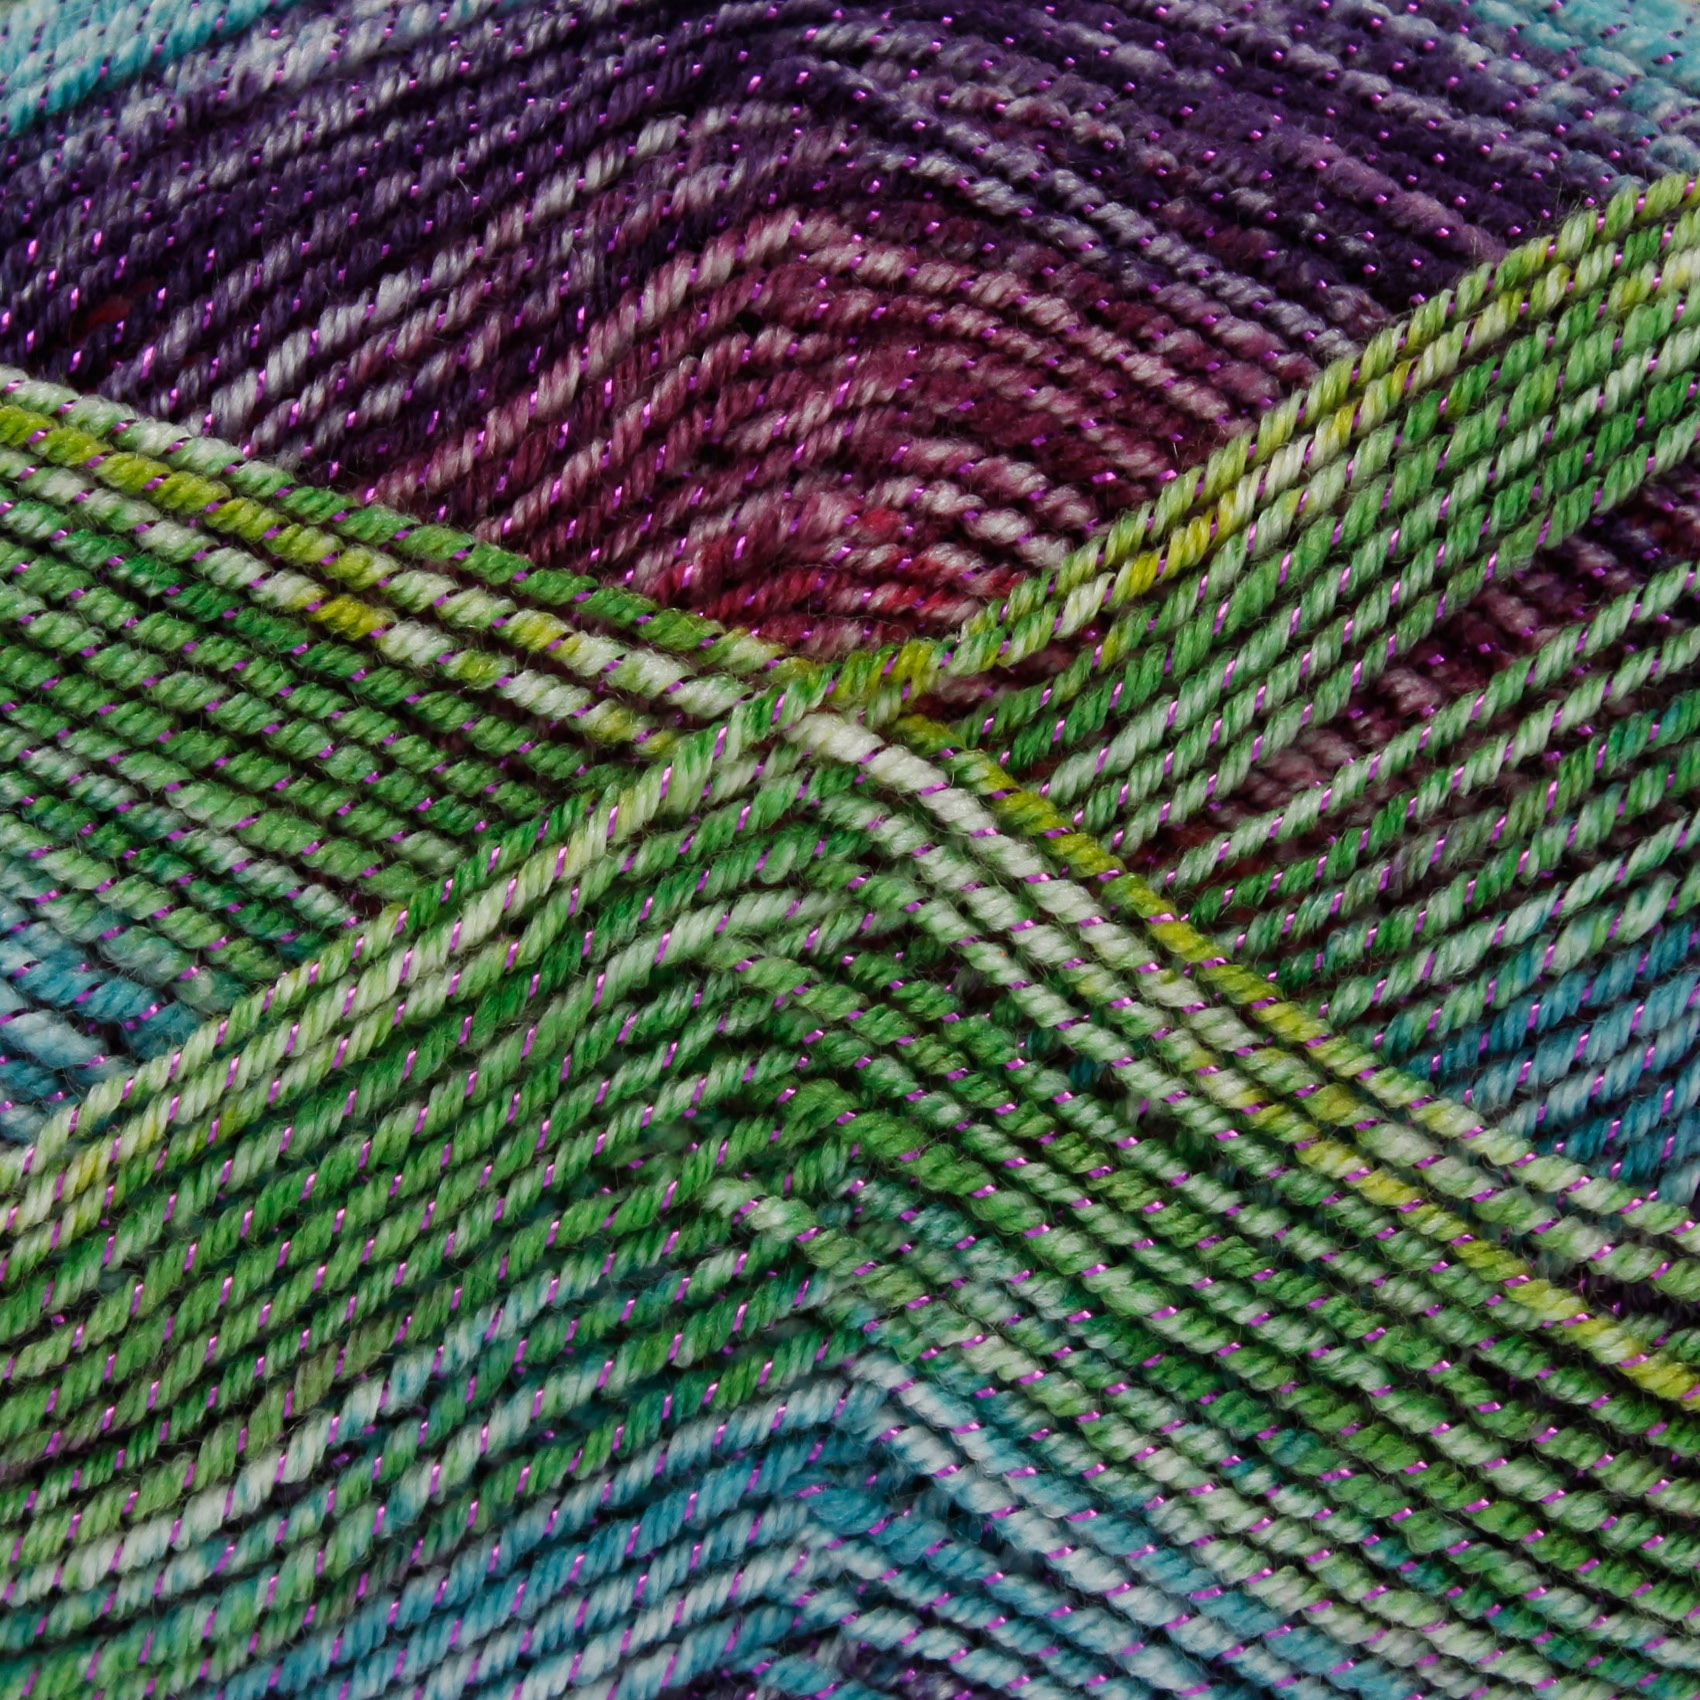 100g Ball Shine DK Double Knitting Wool King Cole Acrylic Blend Sparkle Yarn ...